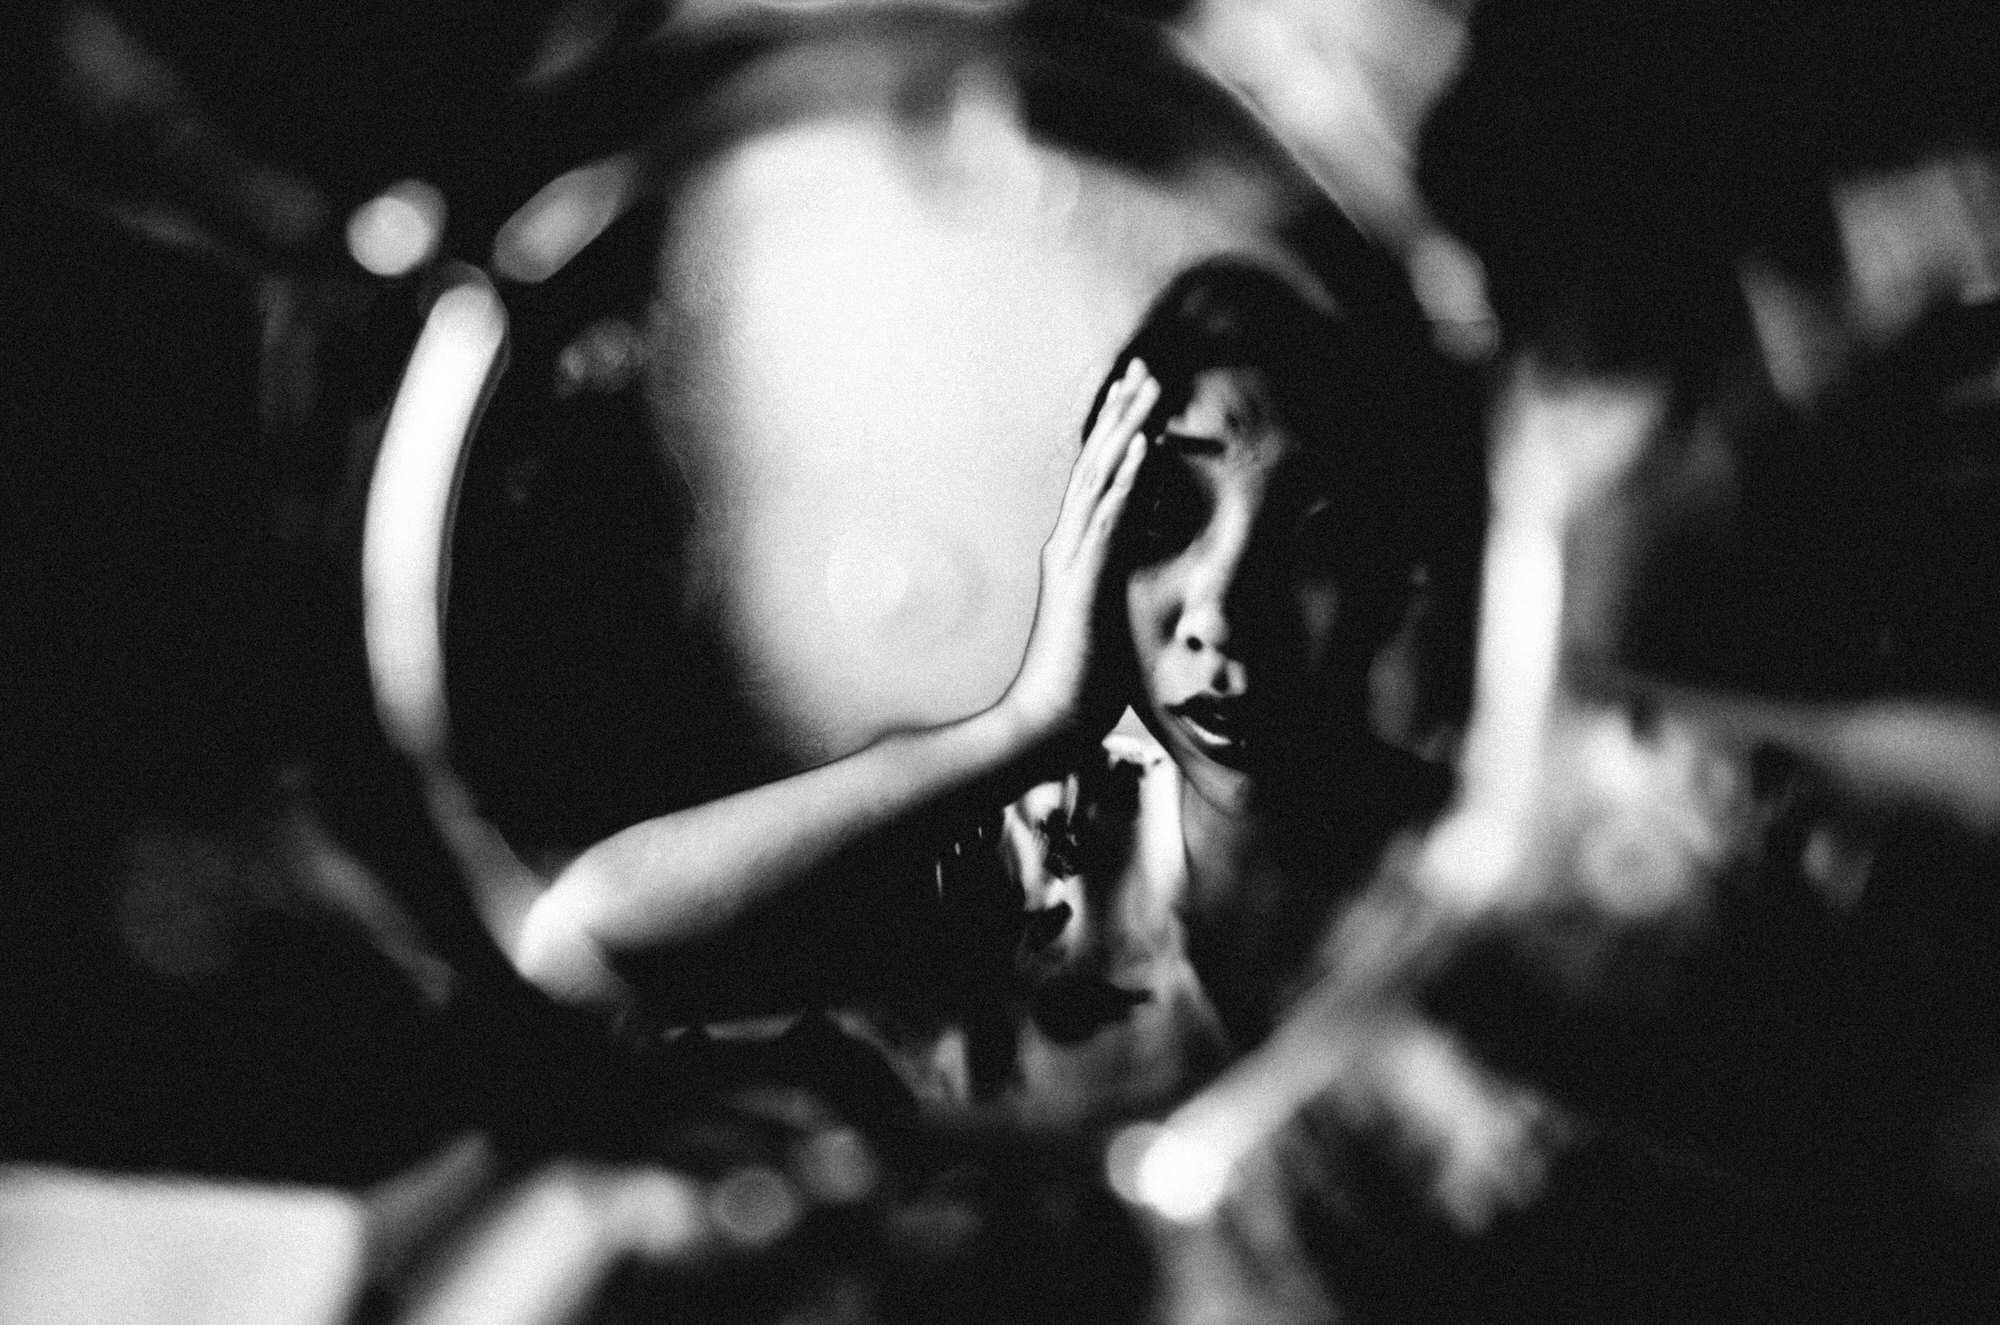 eric kim photography surreal 7